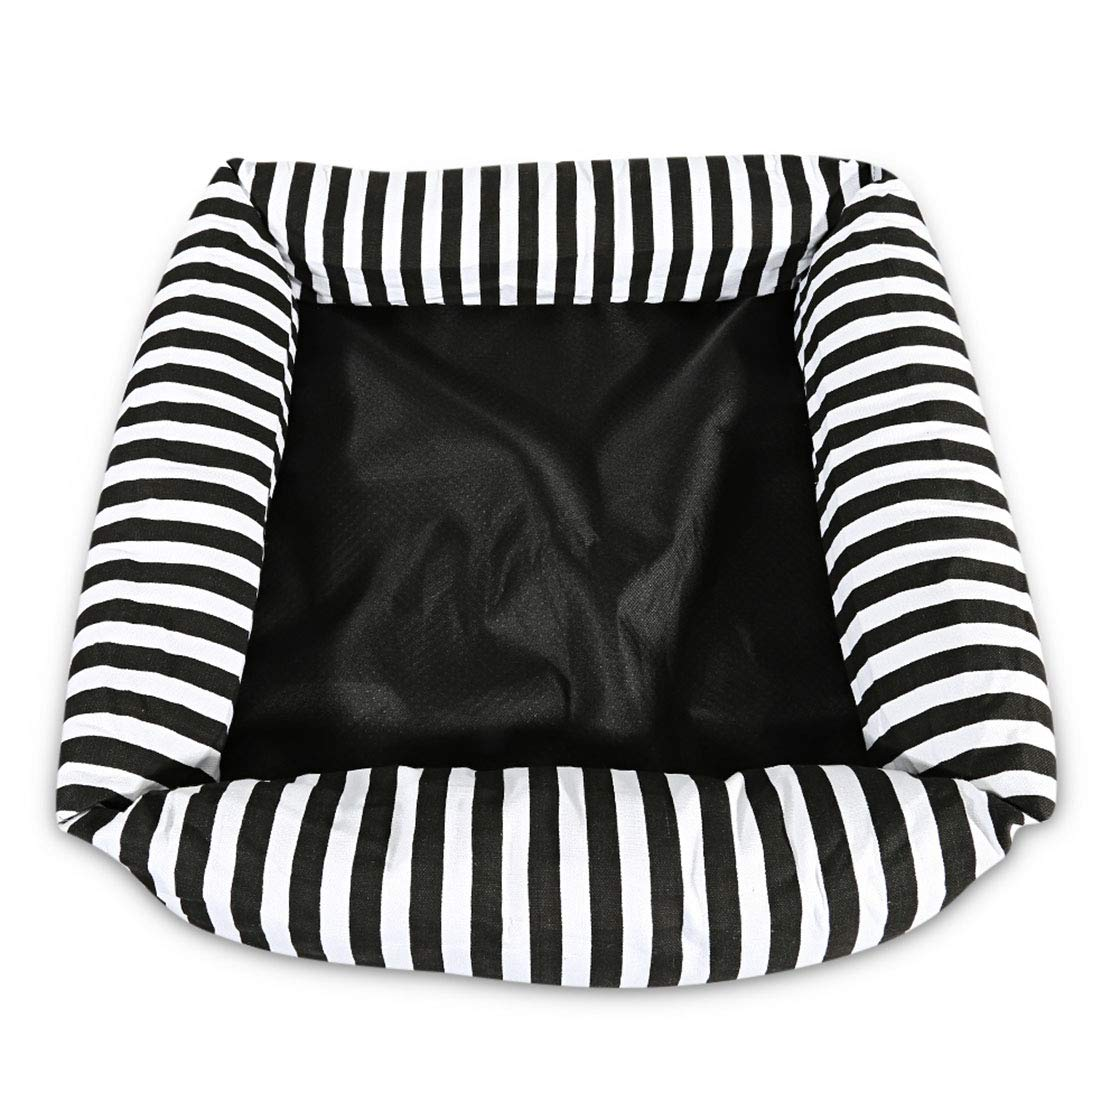 Black 44X44X17CM Black 44X44X17CM Striped Dog Bed Soft Warming Material Back Nest Cat Baskets Fall Winter Warm Pet House